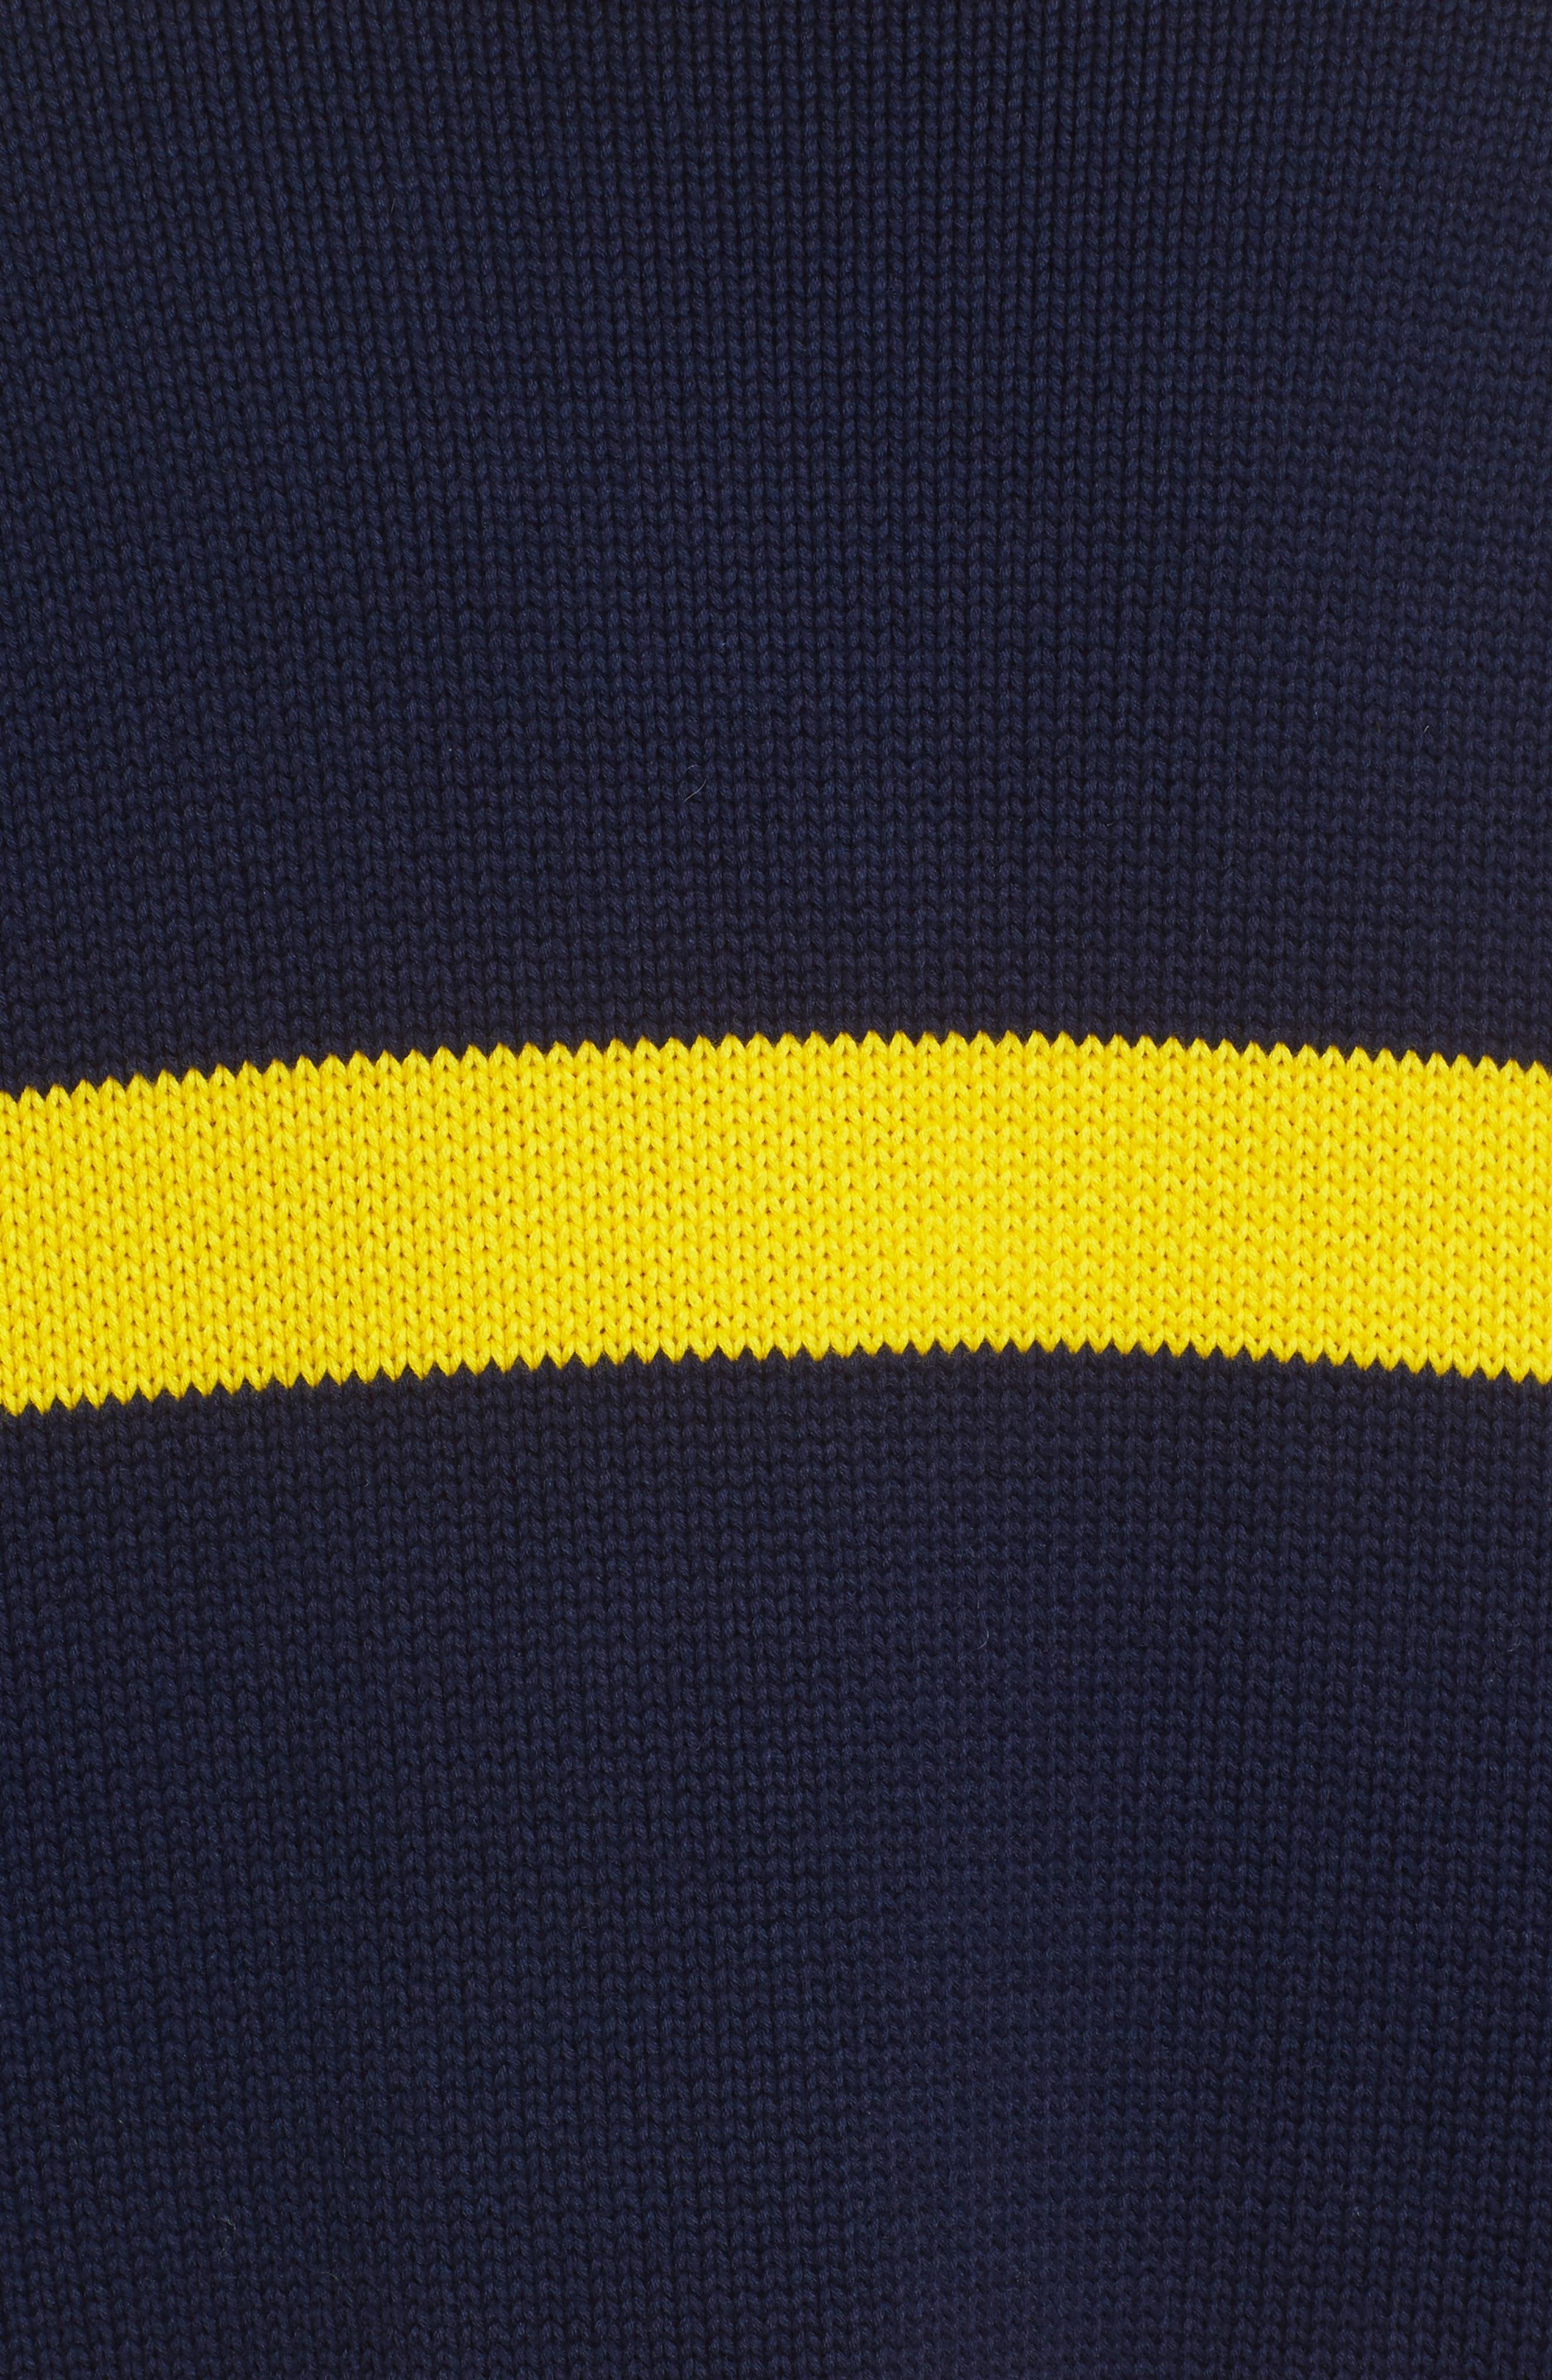 PUMA by Rihanna Longline Stripe Sweater,                             Alternate thumbnail 5, color,                             Navy/ Yellow Stripe